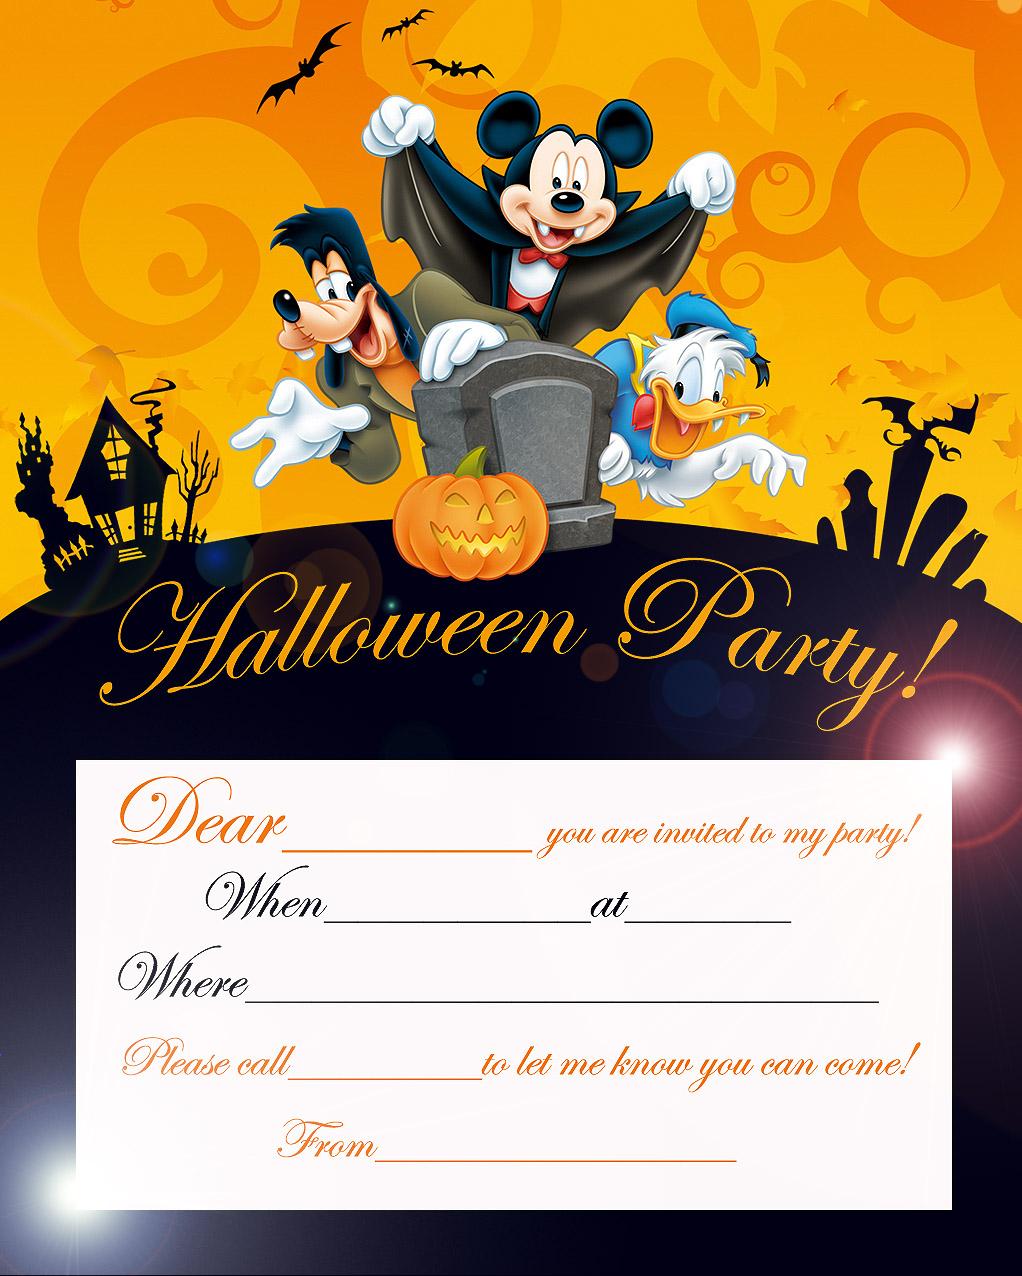 Mickey Mouse Halloween Invitations Mickey Mouse Halloween Birthday